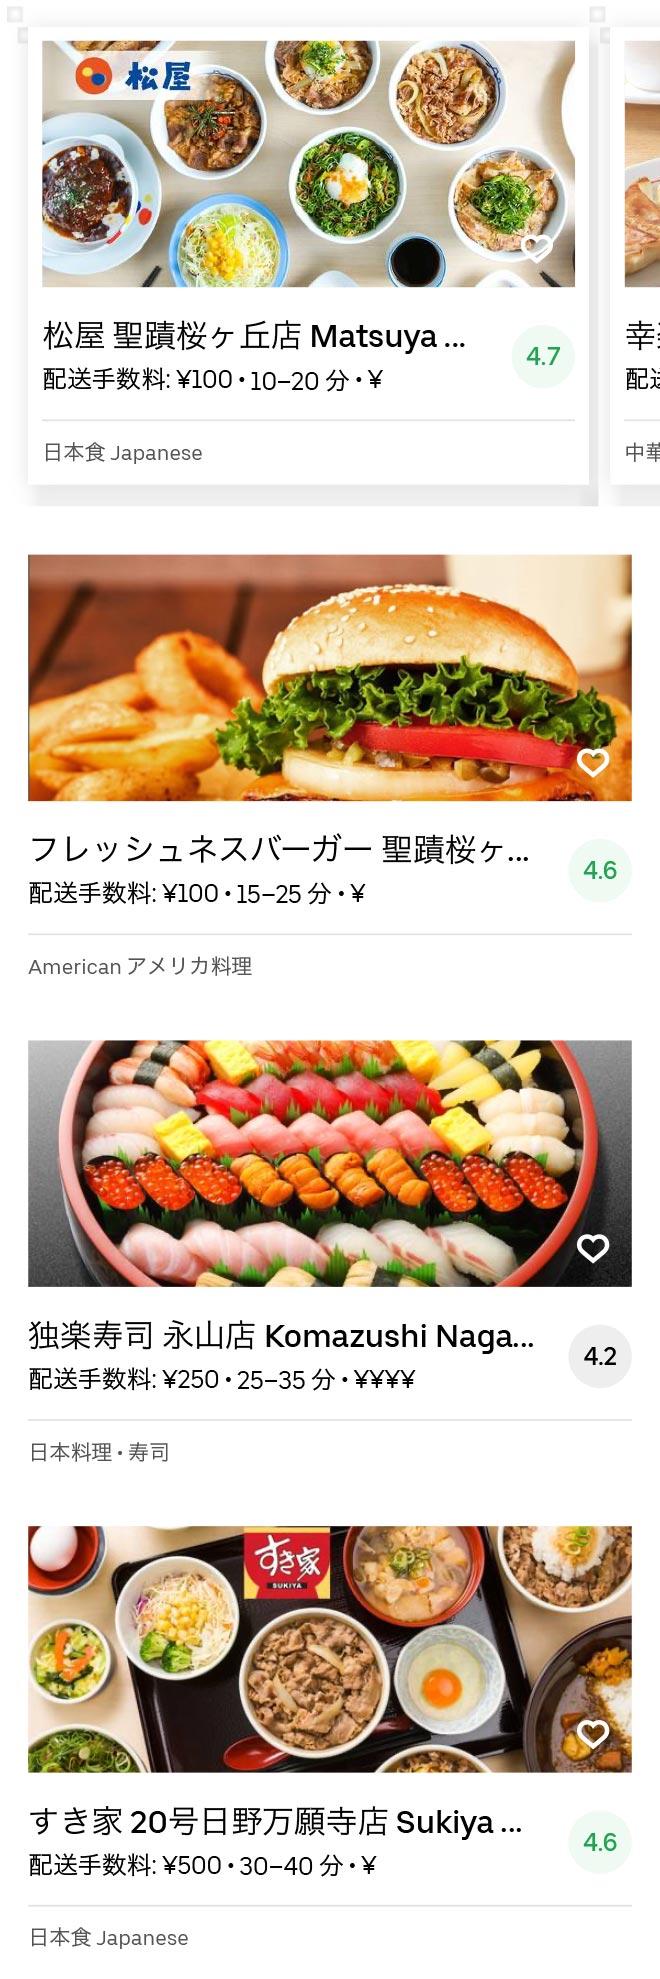 Seiseki menu 2007 03